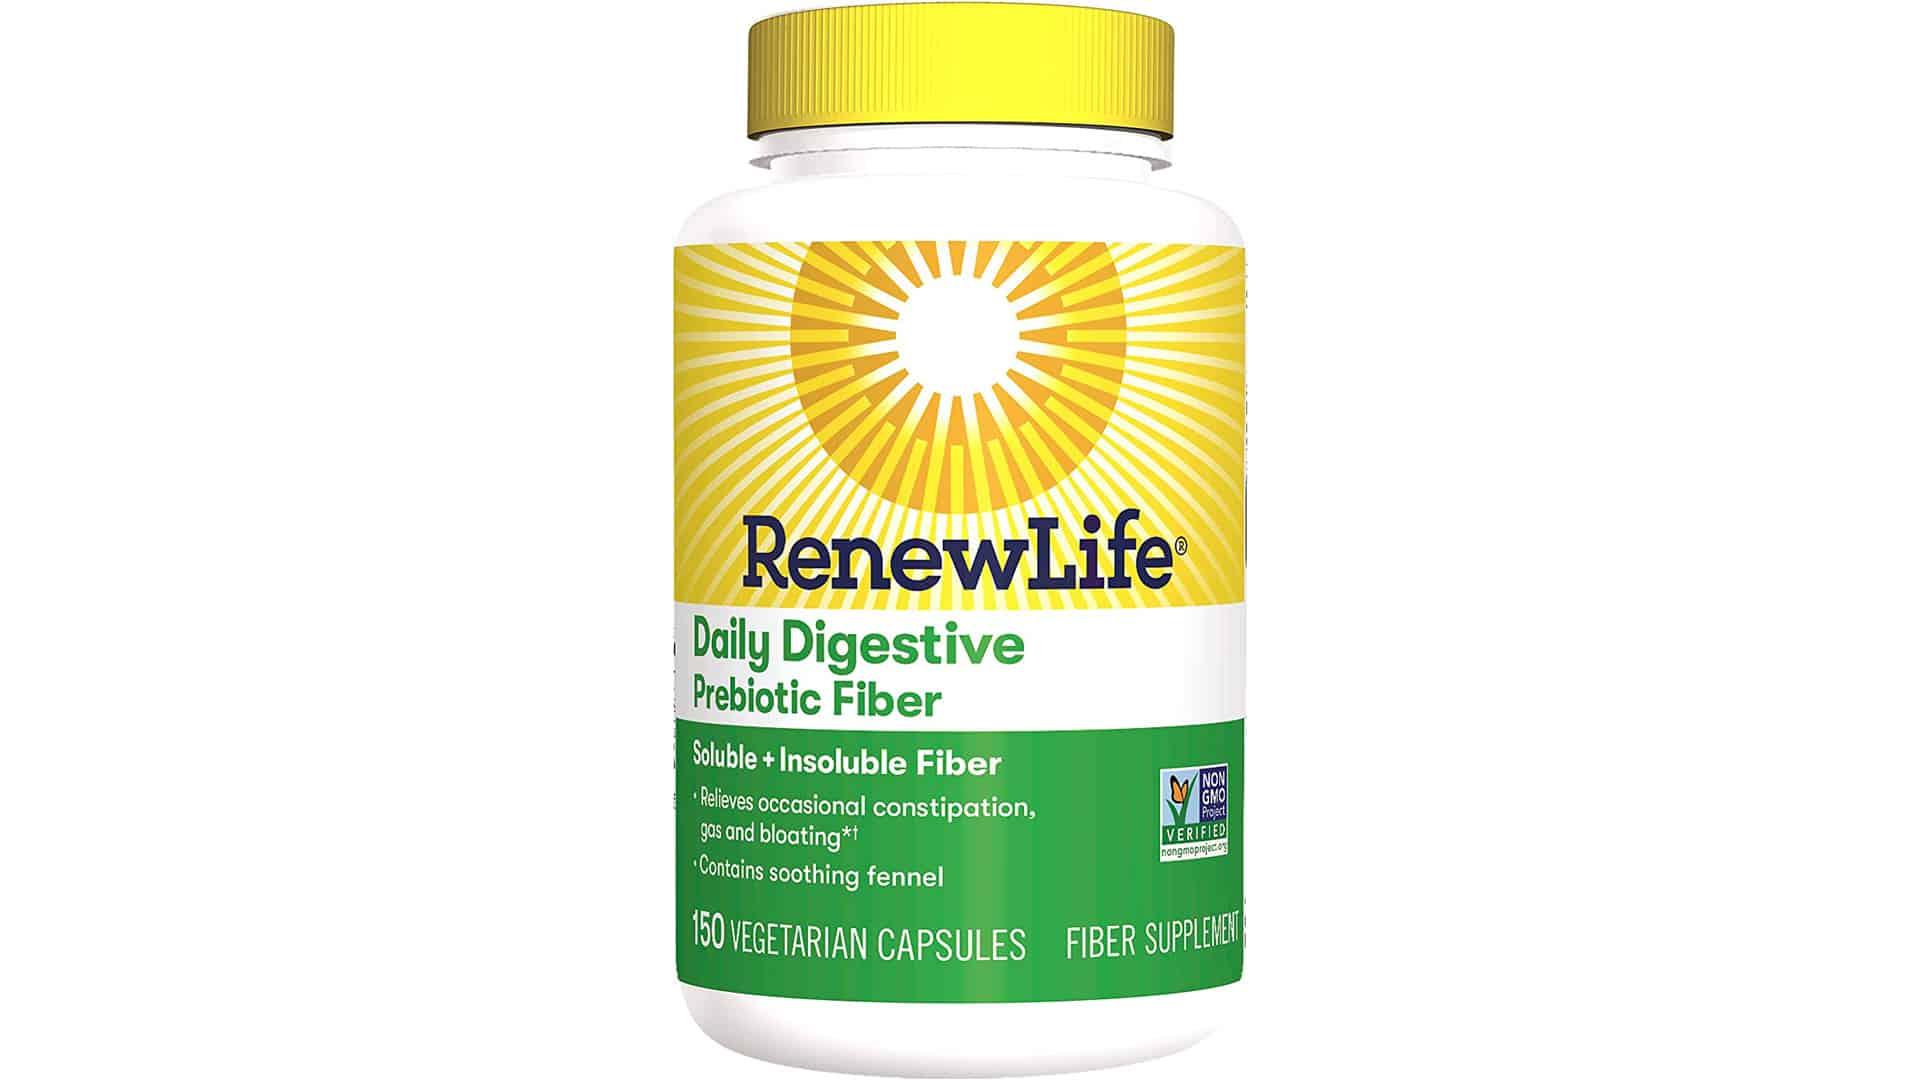 Renew Life Daily Digestive Prebiotic Fiber